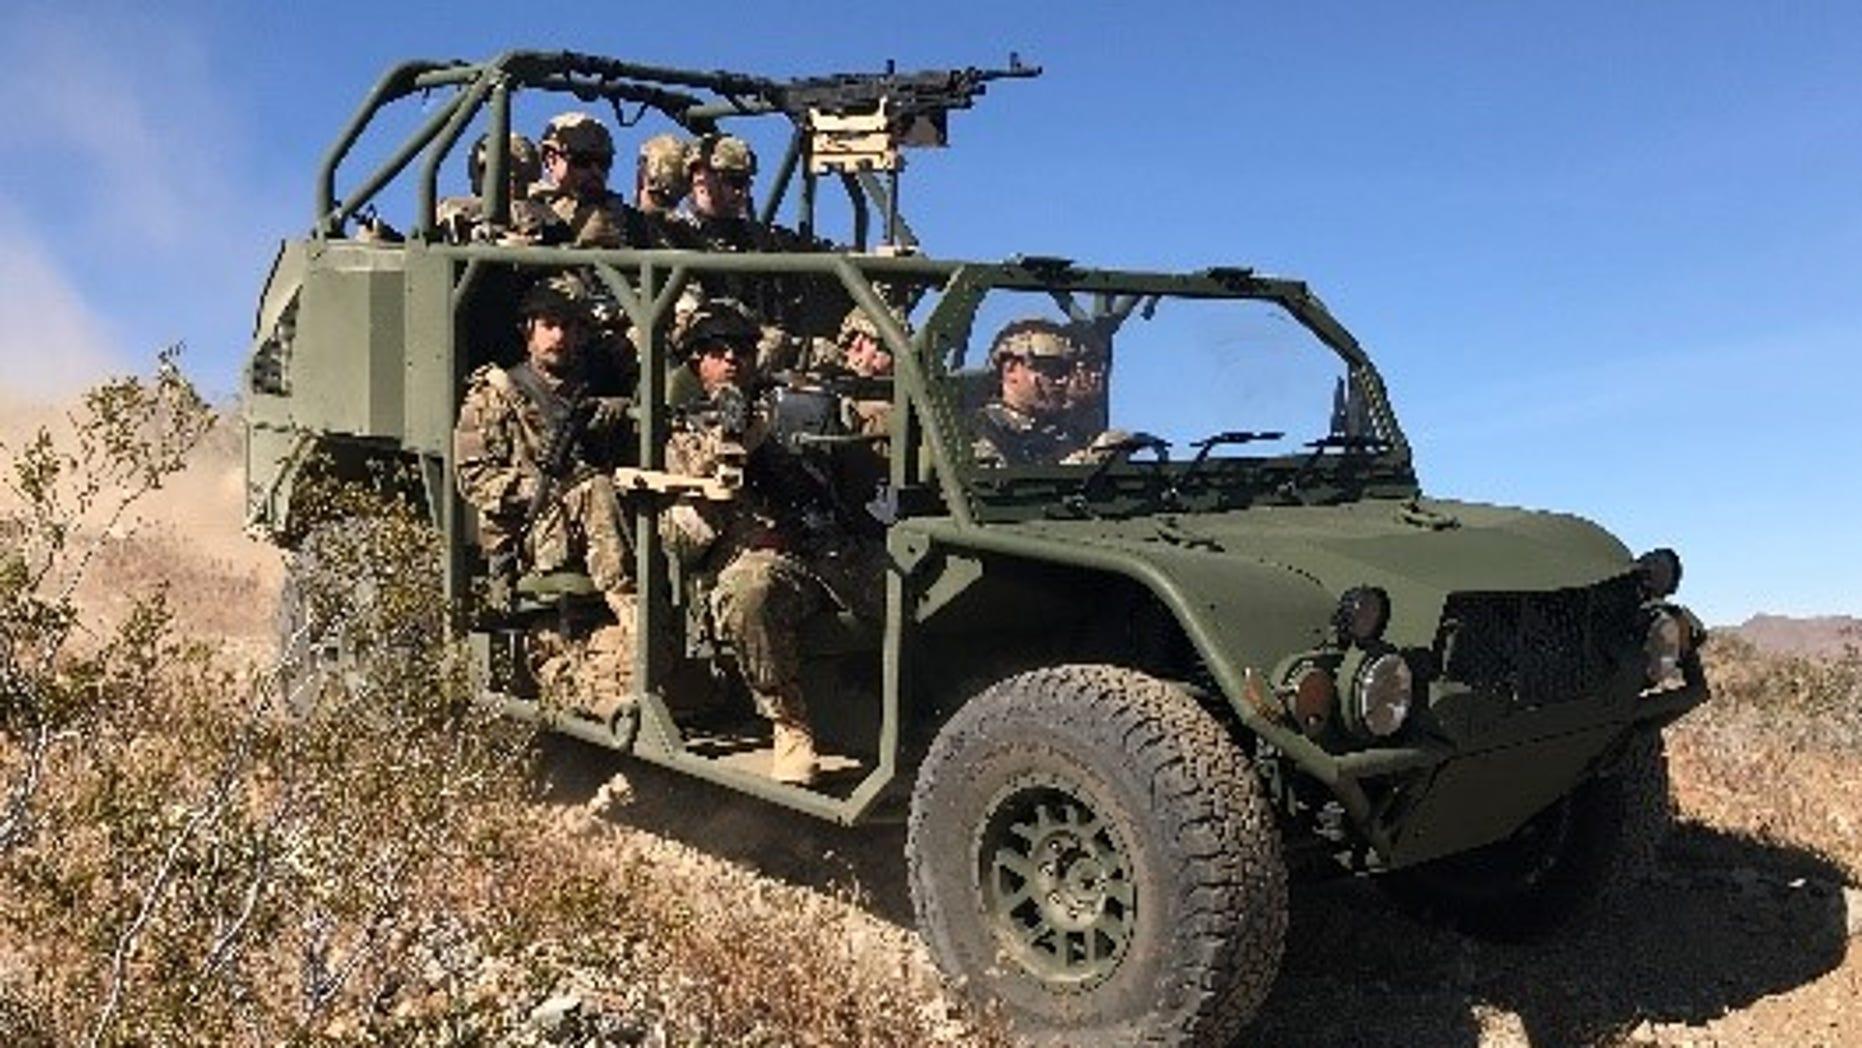 Infantry Squad Vehicle (ISV)